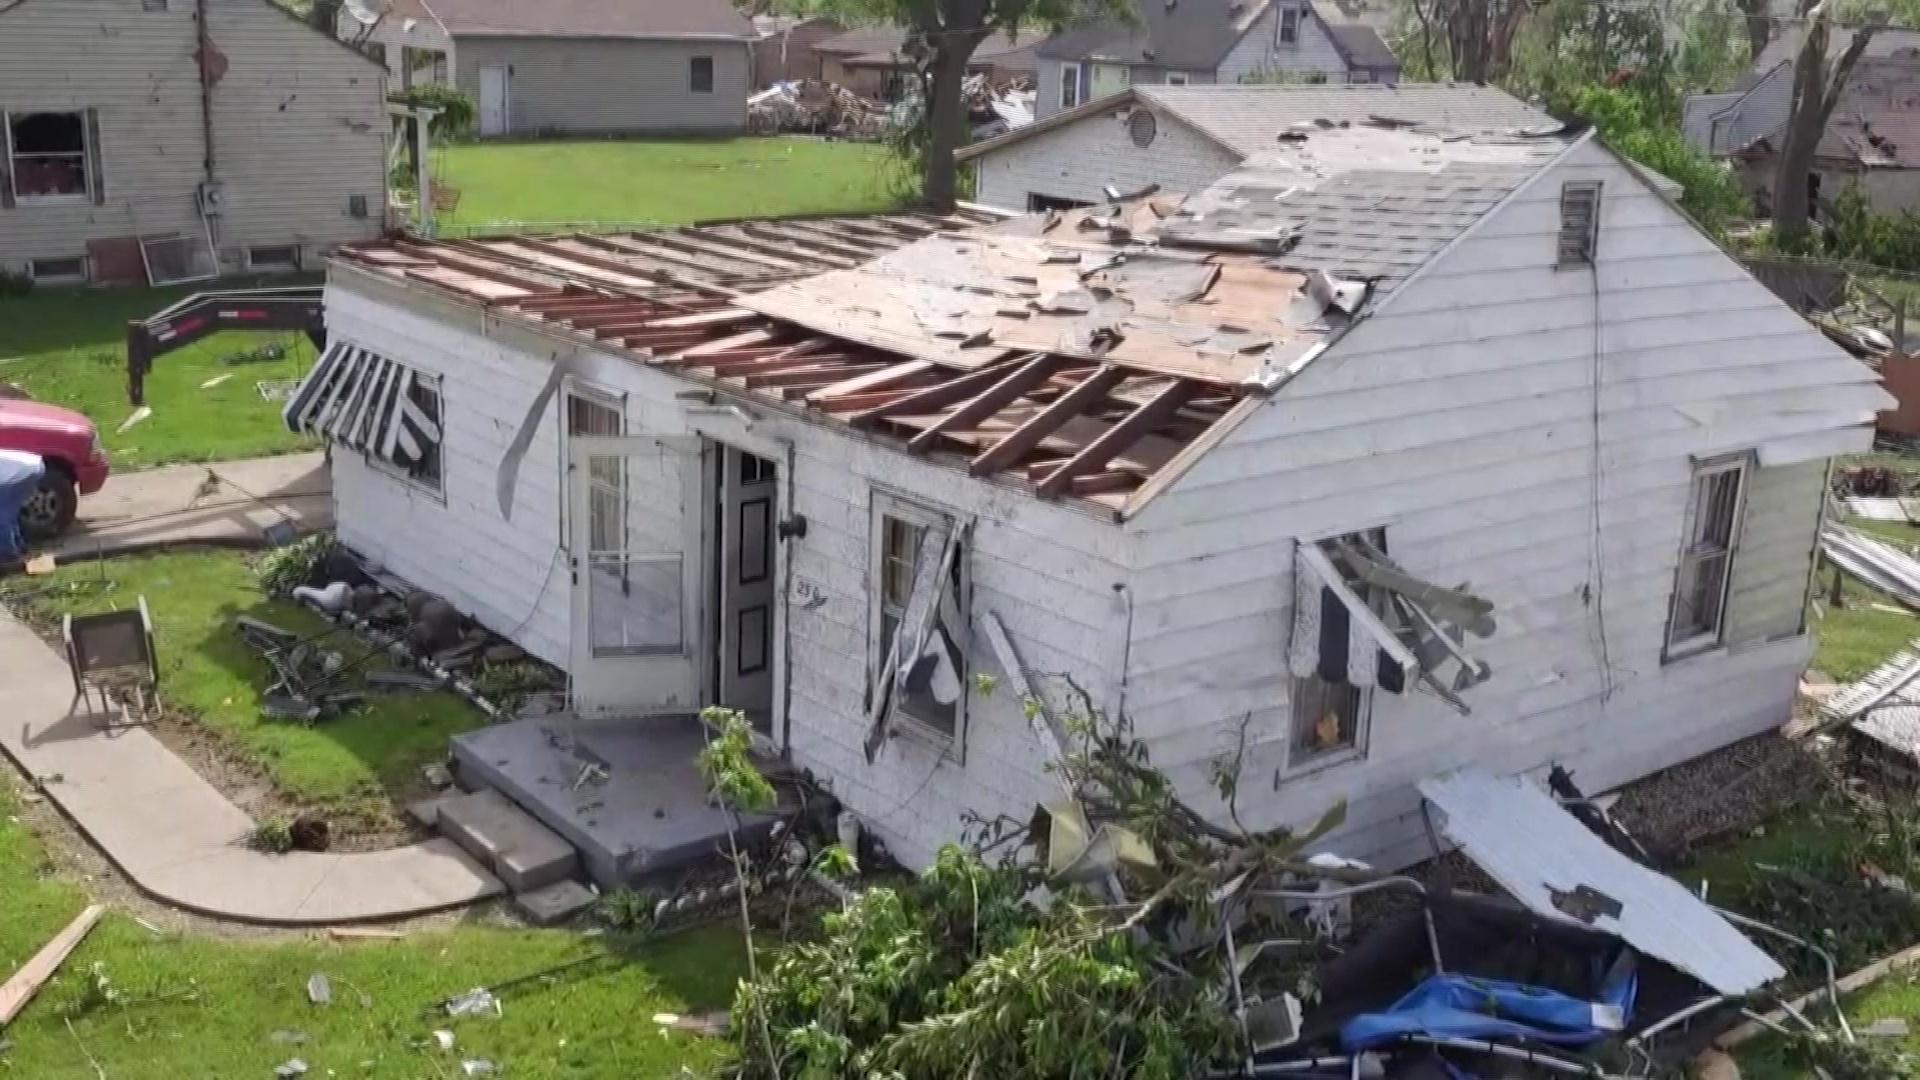 RAW__NBC4_s_drone_surveys_tornado_damage_0_20190528161616